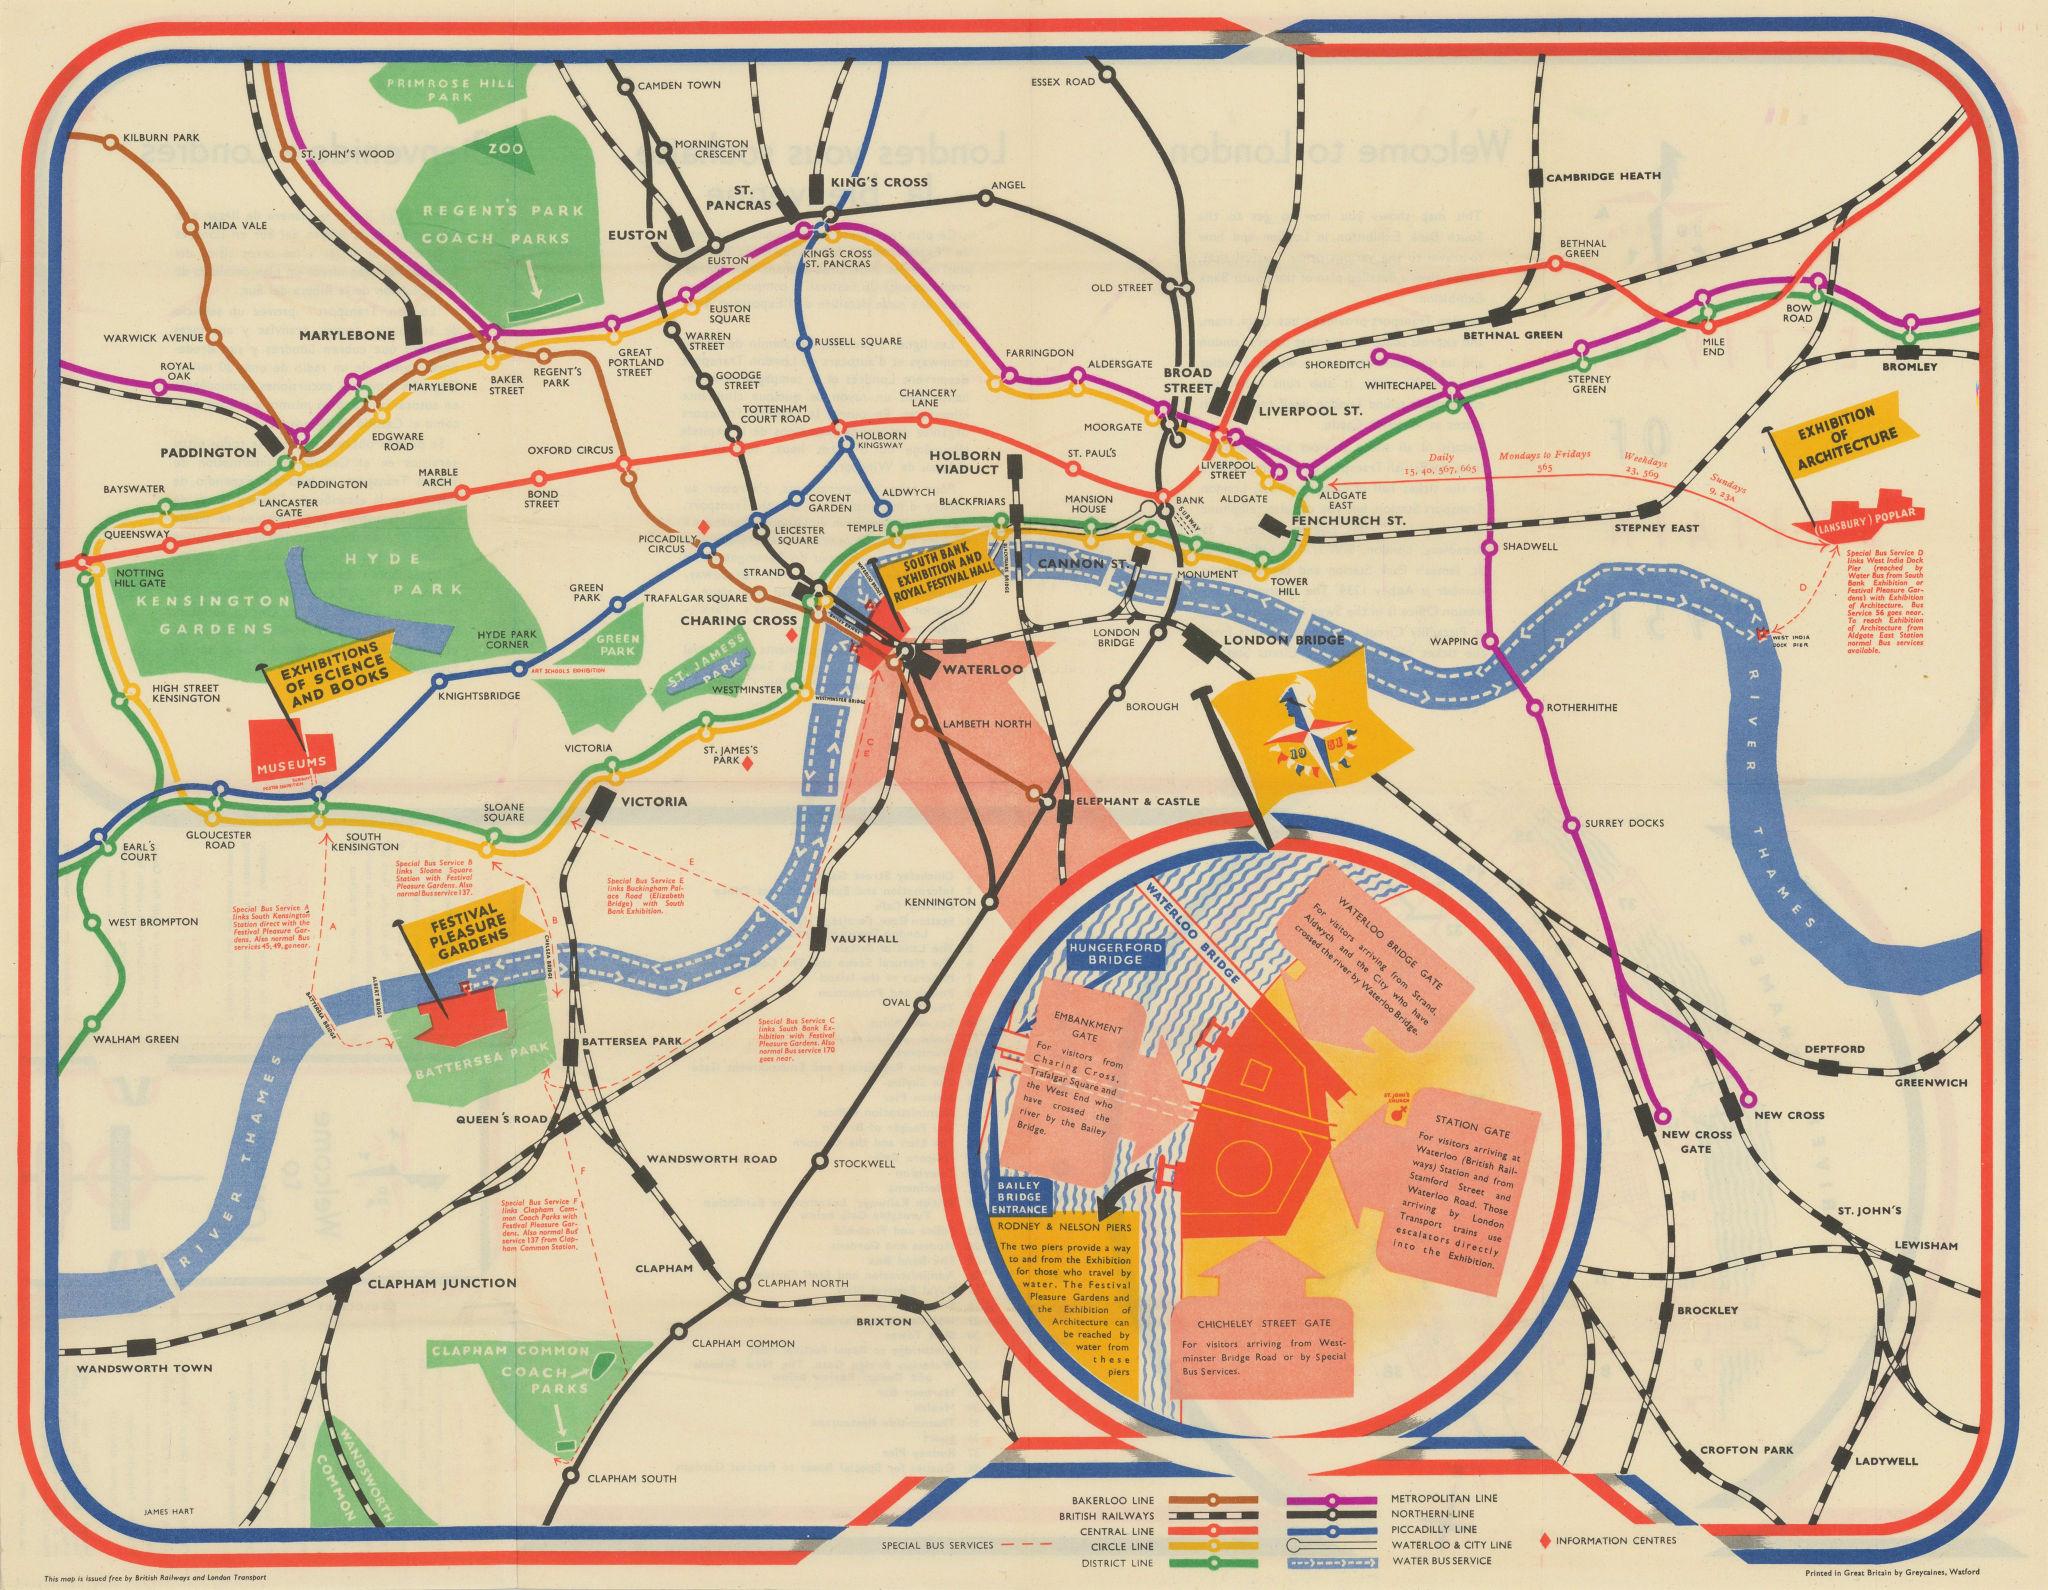 Festival of Britain 1951. London Transport. British Railways. HART 1951 map